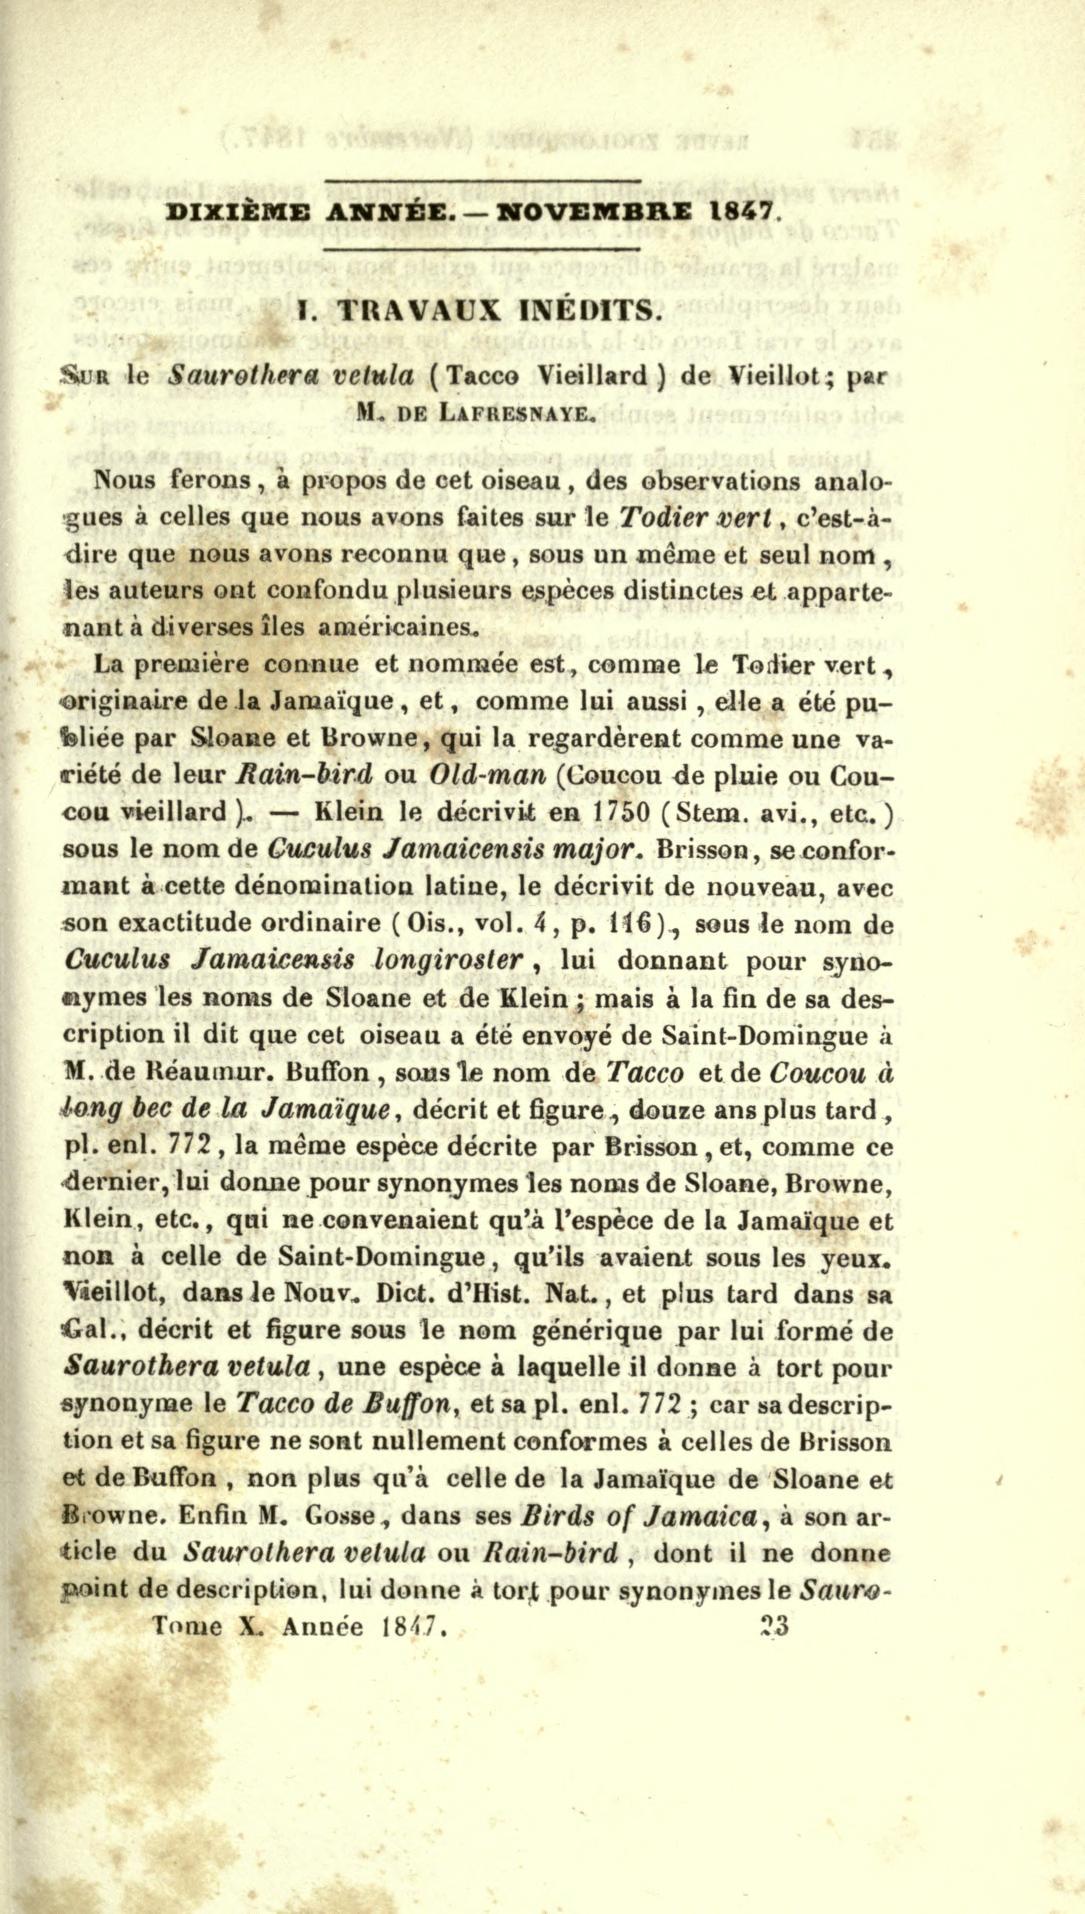 I. Travaux Inedits. Sur le Saurothera vetula (Tacco Vieillard) de Vieillot